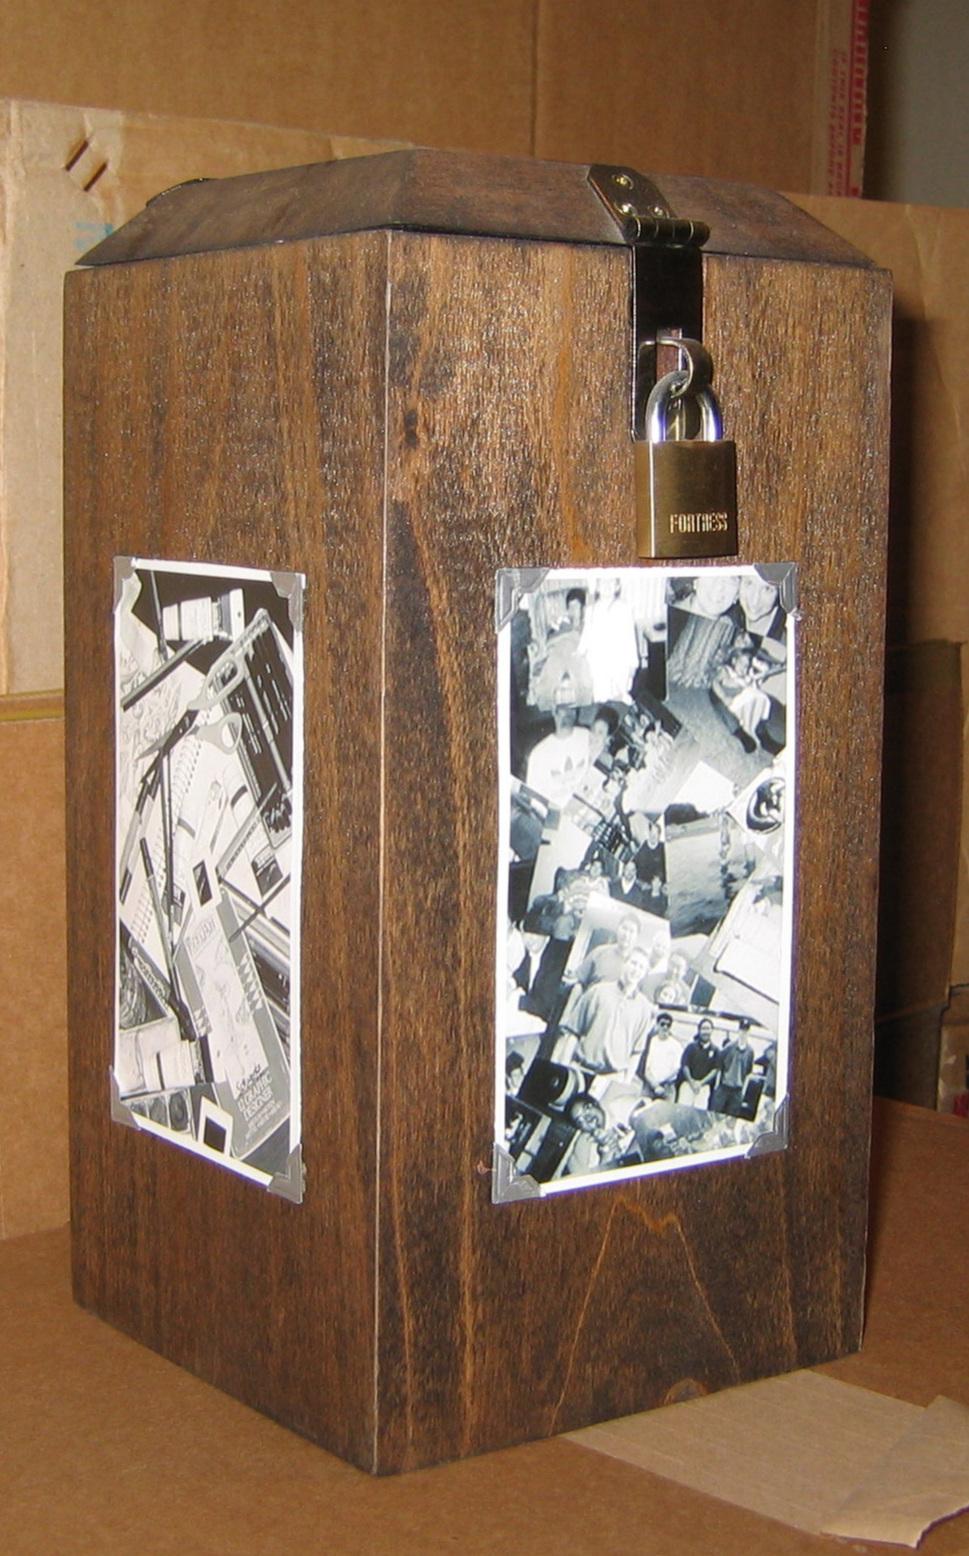 2003 // Central Michigan University Annual Juried Student Exhibition - Mt. Pleasant, MISelf Portrait SculptureMixed Media - Pine, Plexiglass, Ribbon, Sharpie, Metal Hinges/Lock, Photos